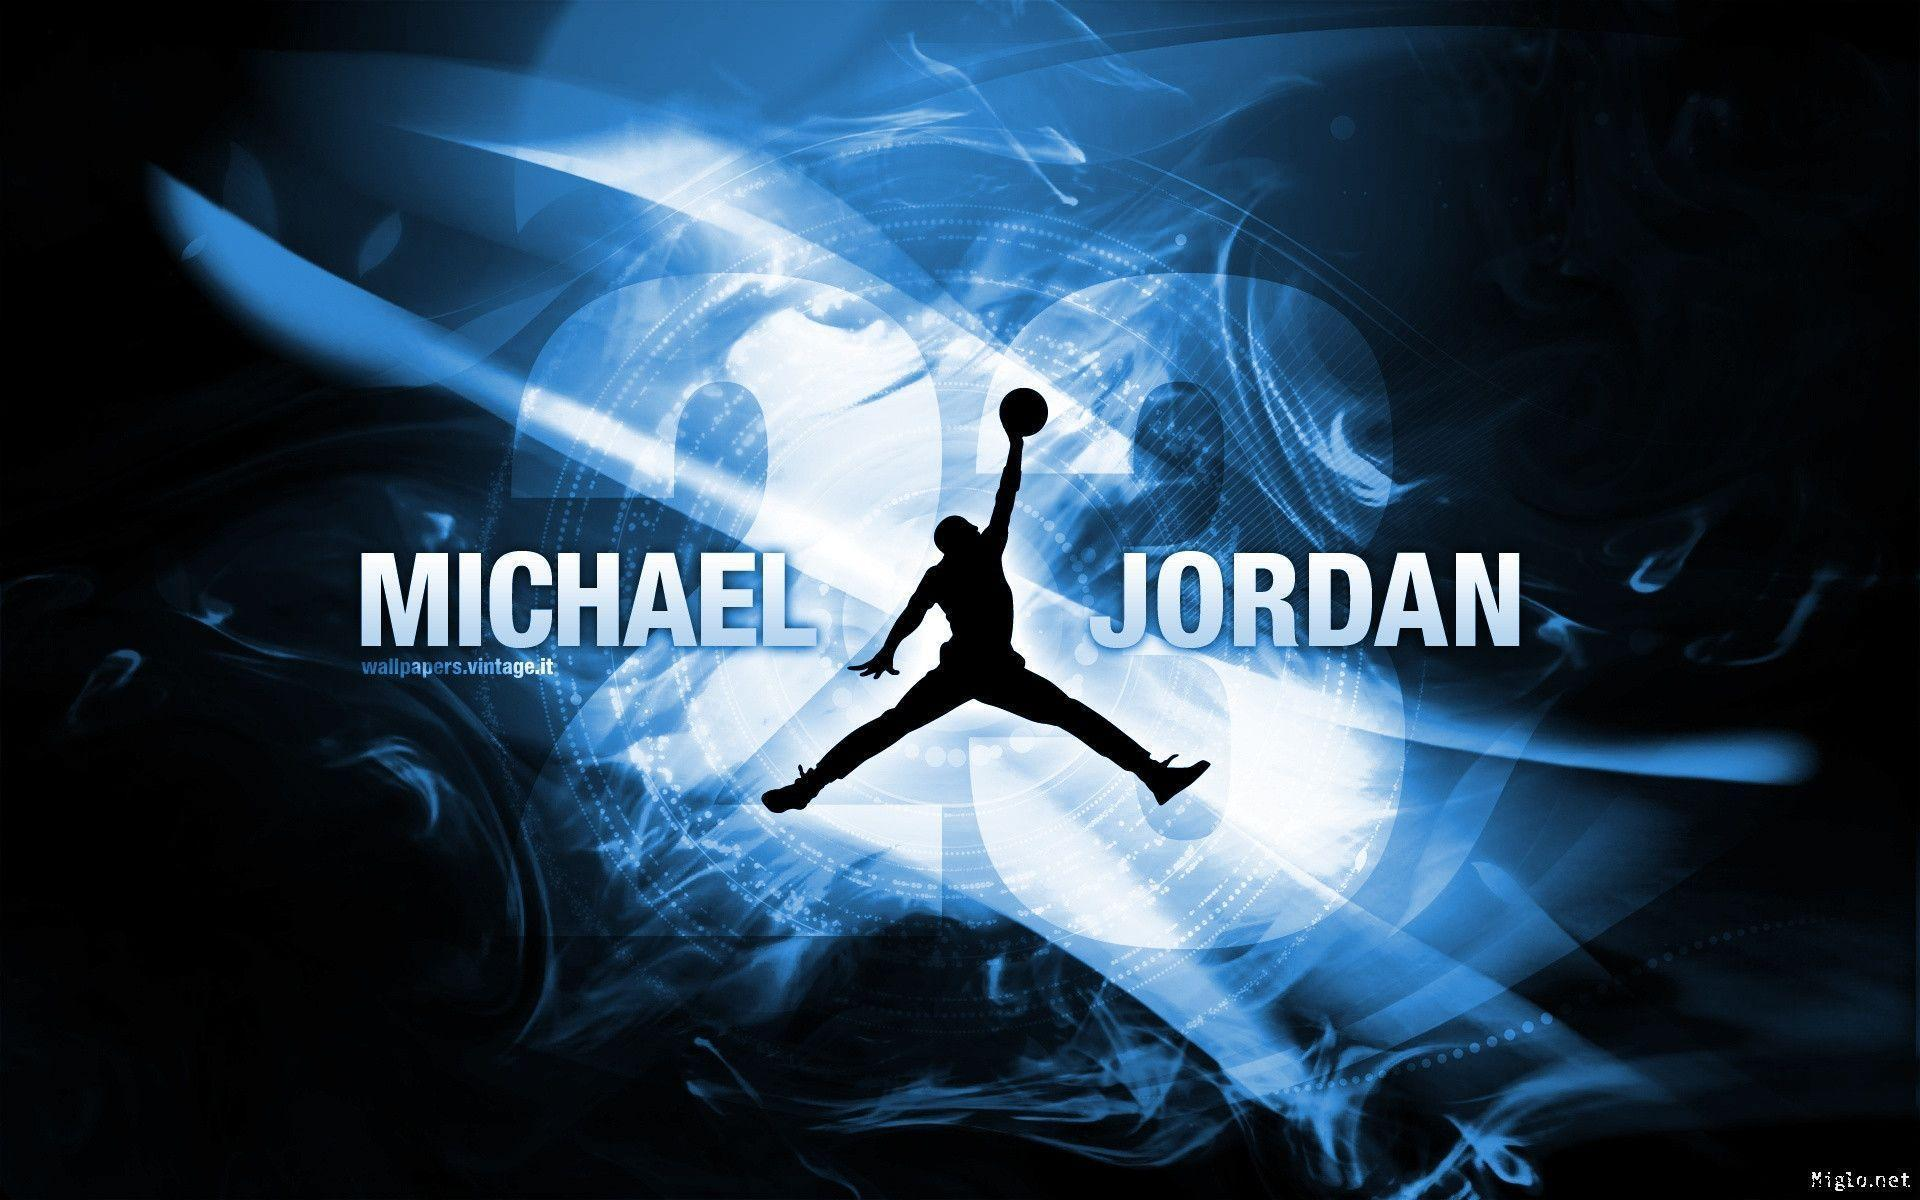 michael jordan logo wallpapers wallpaper cave. Black Bedroom Furniture Sets. Home Design Ideas